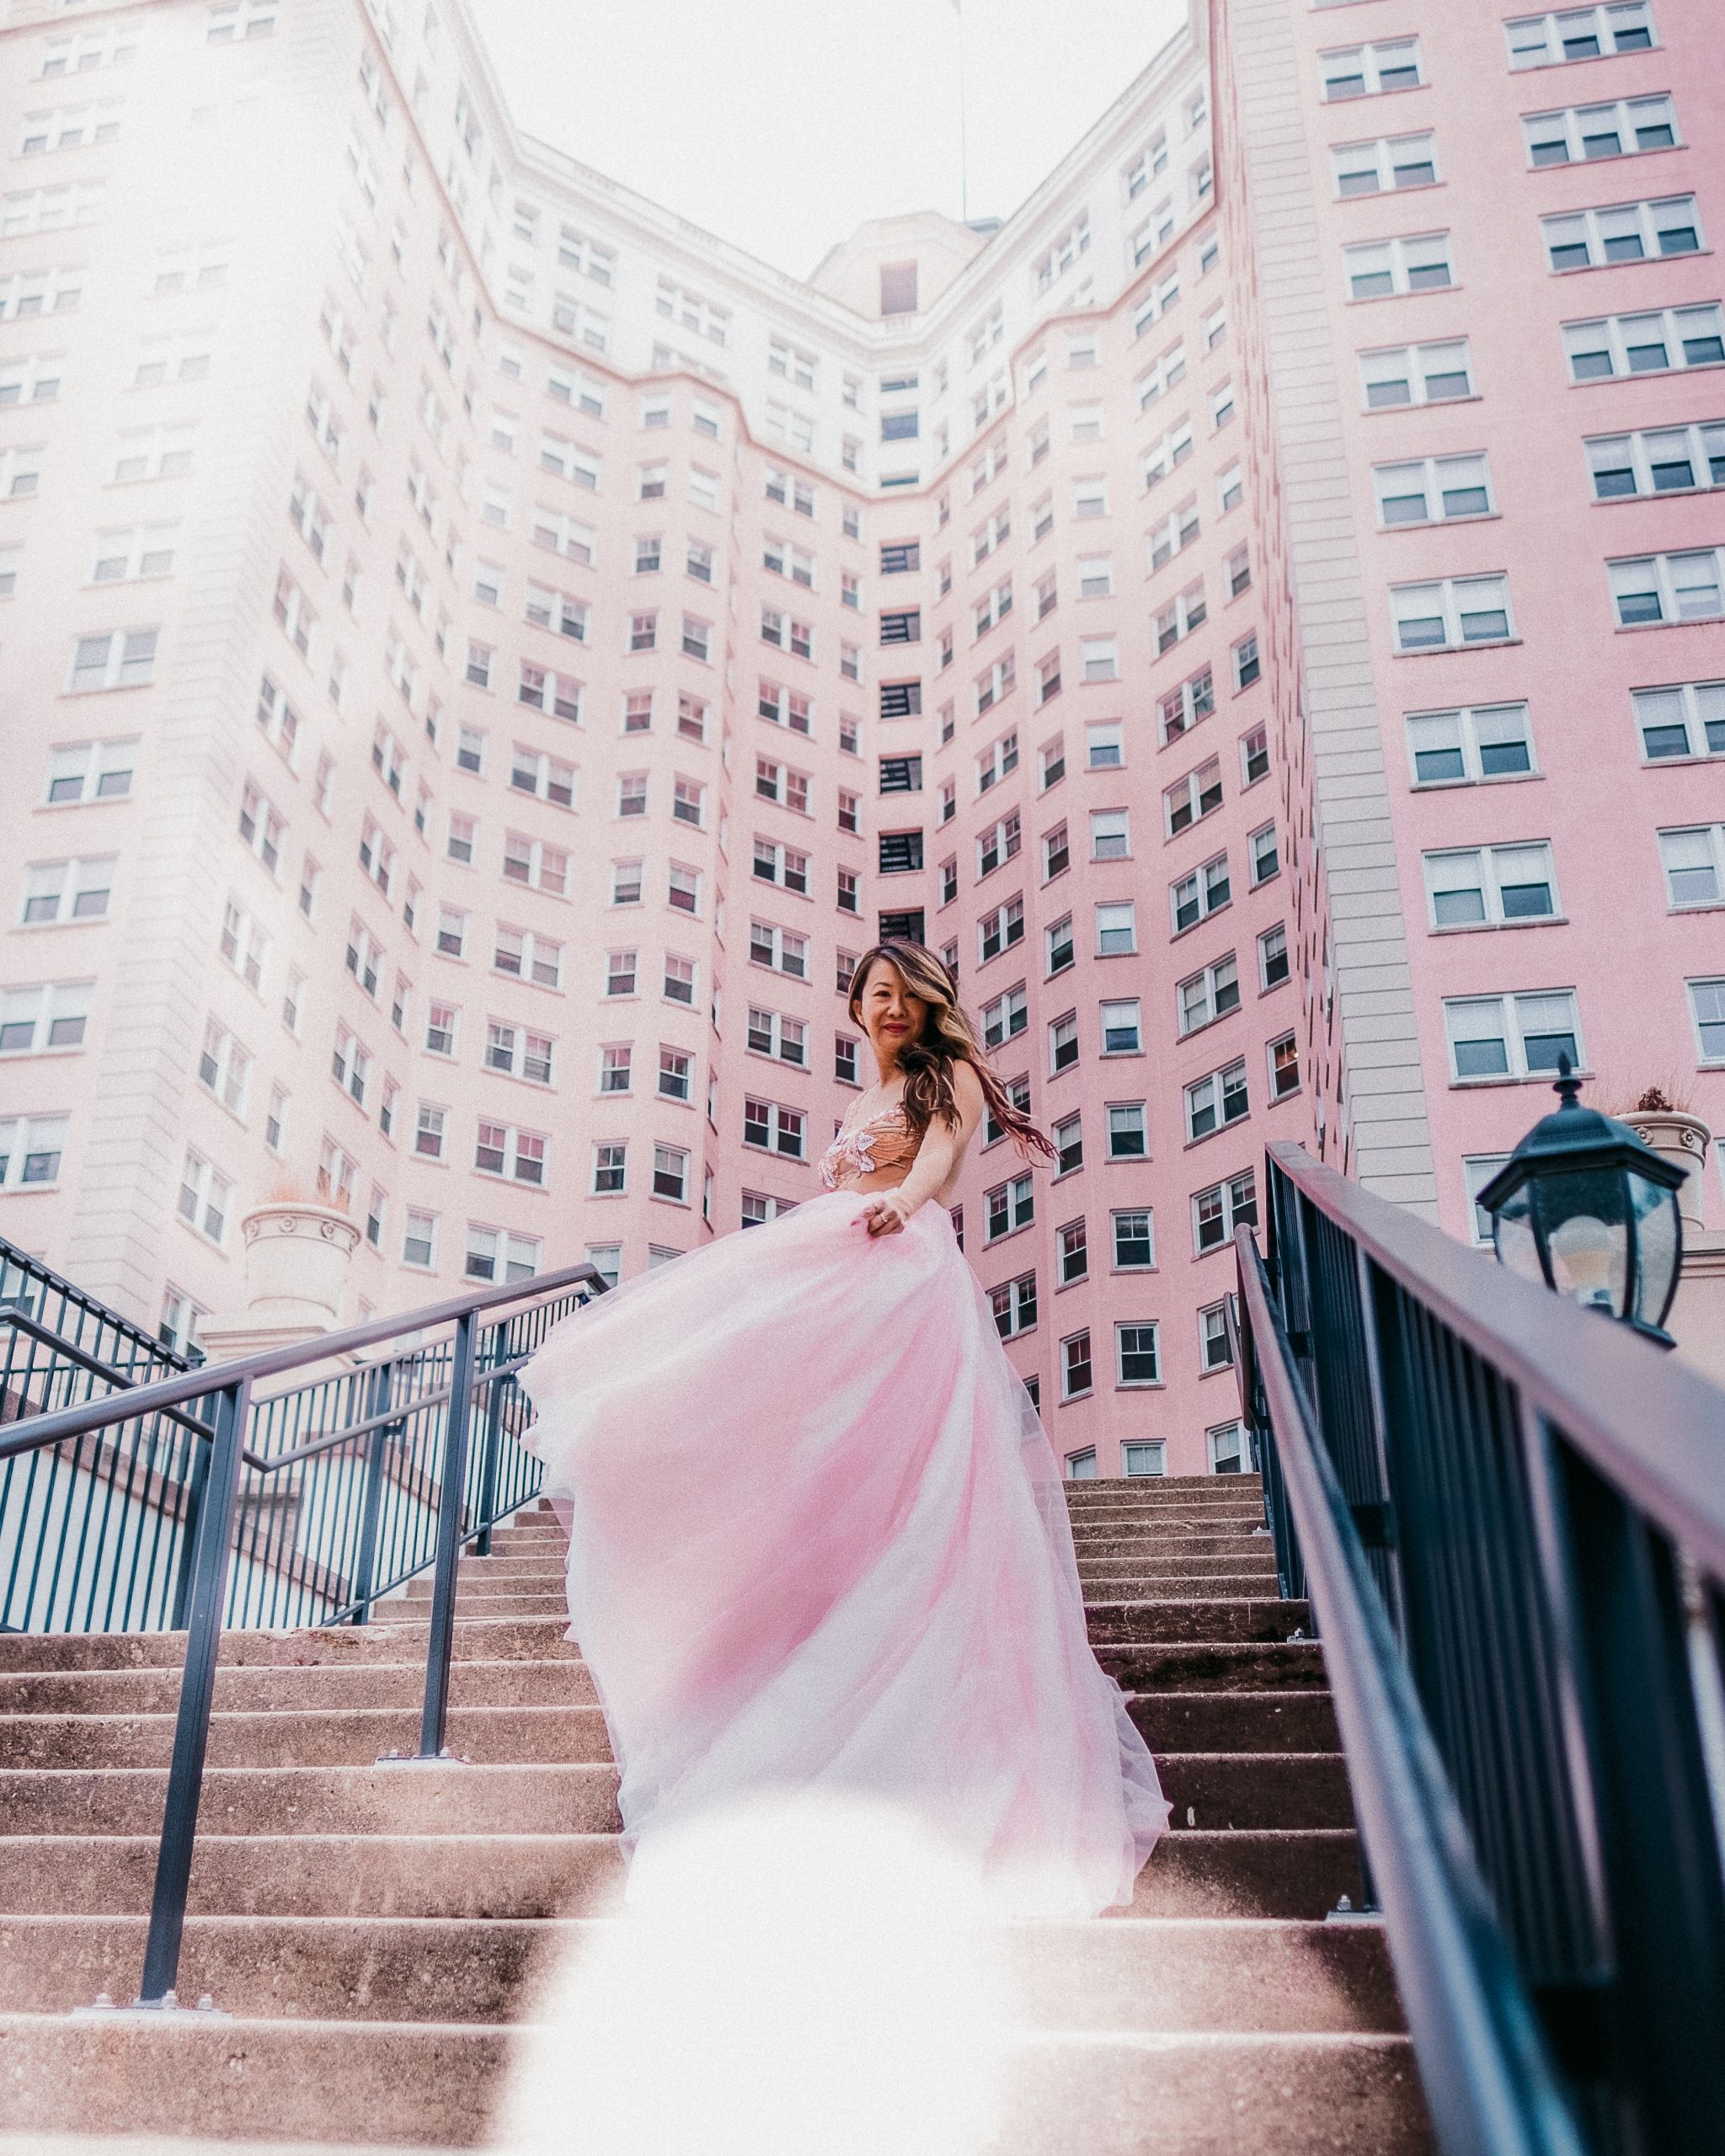 Viero Bridal Custom Gown, Viero Bridal Chicago, Pink Tulle Custom Gown Chicago, Best Bridal Salon Chicago, Chicago Fashion Blogger, Pink Edgewater Hotel, Custom gowns in Chicago, Jennifer Worman